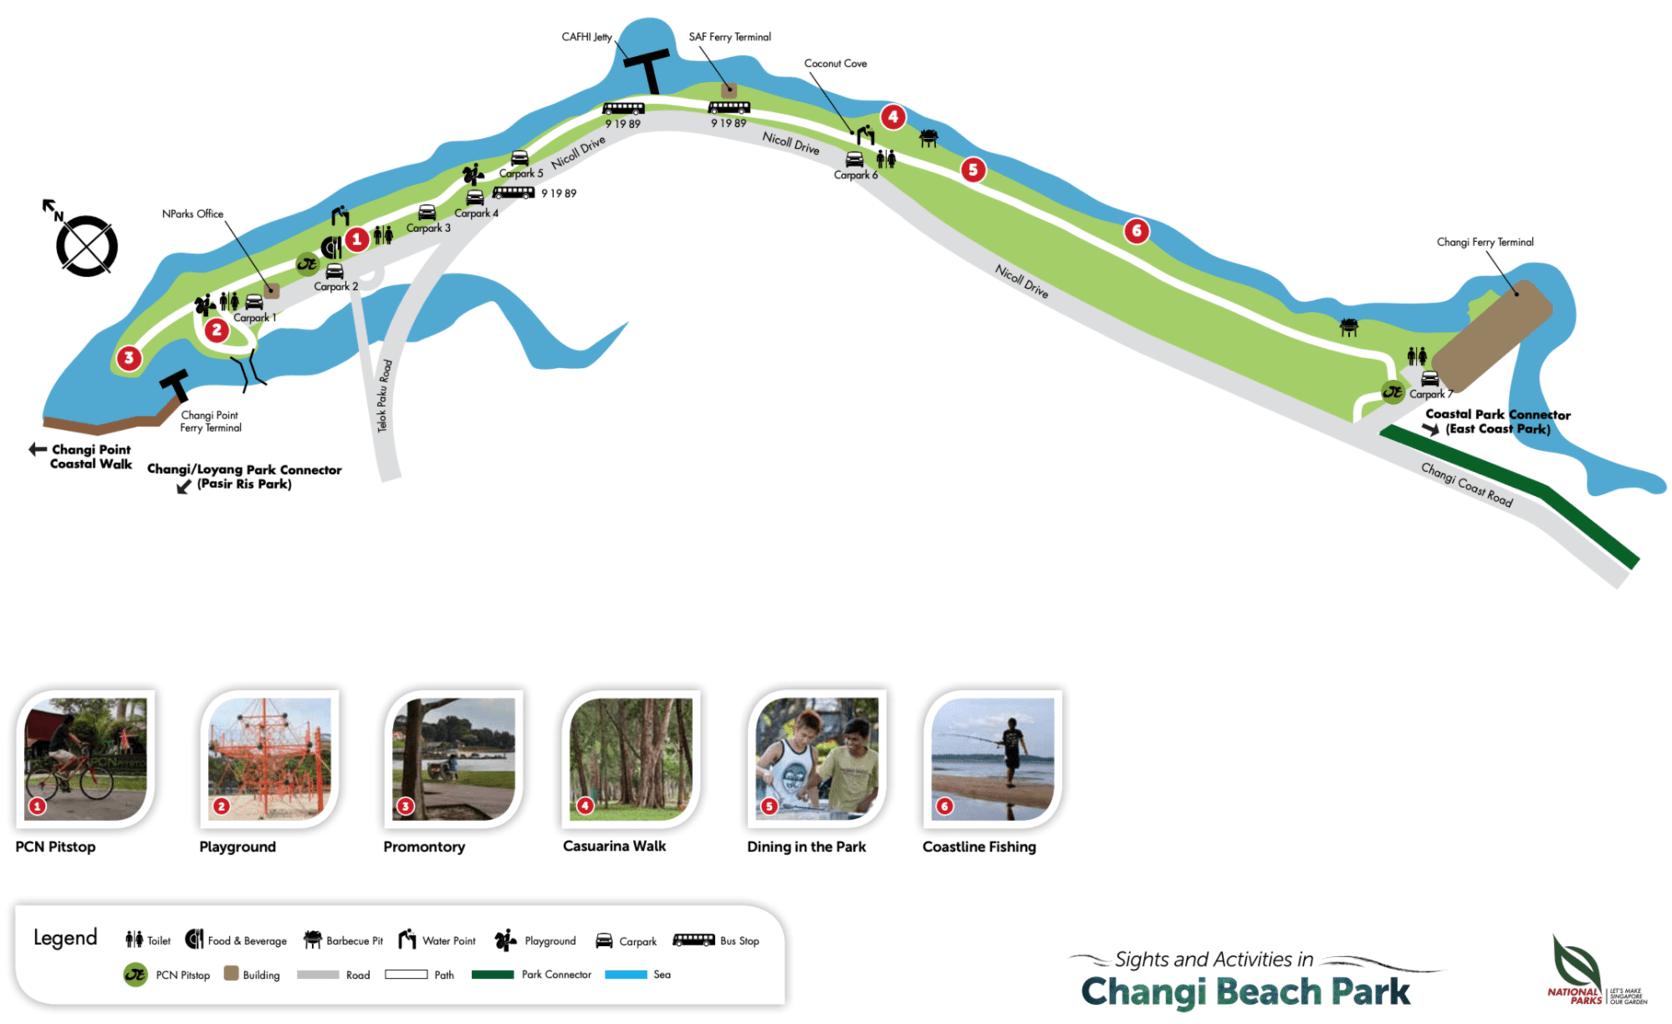 Changi Beach Park map